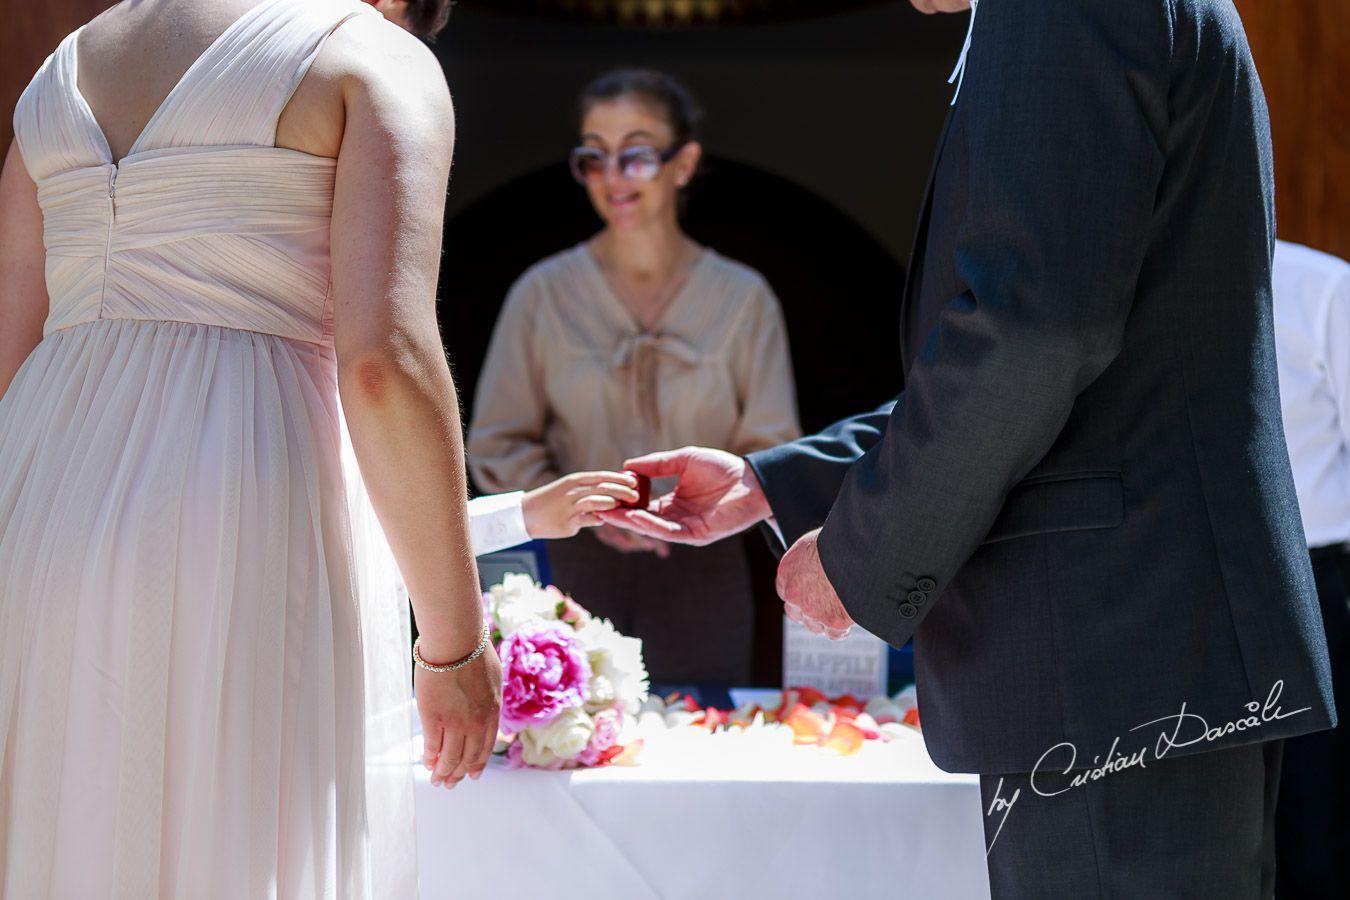 Le Meridien Wedding Limassol - George and Nicole - 21